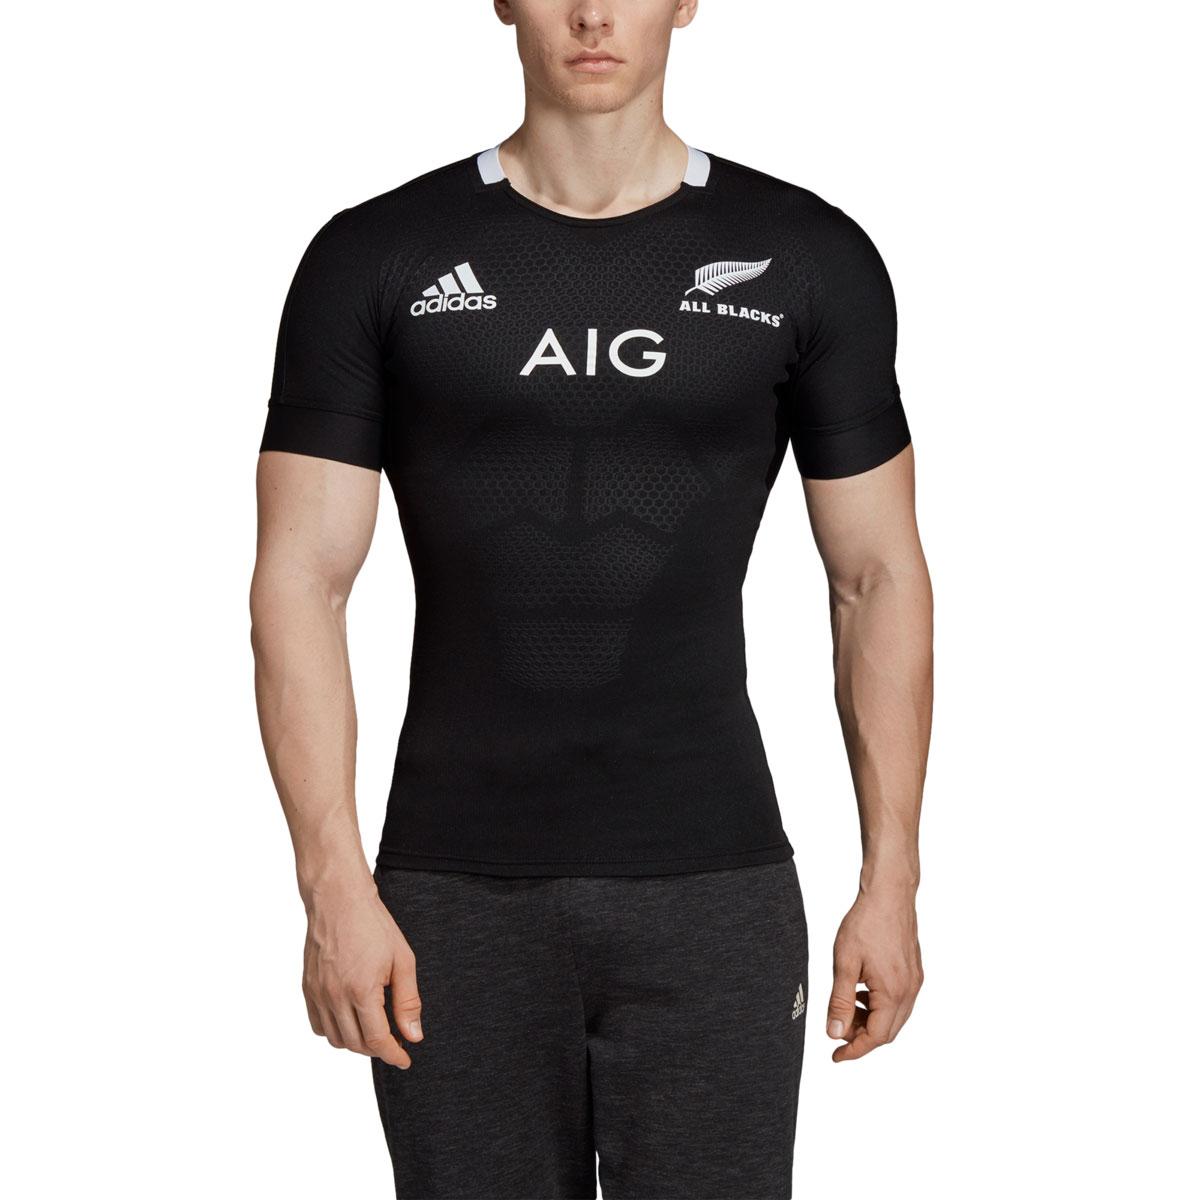 3348dc0e67f 2019 Mens All Blacks Performance Home Rugby Shirt (Short Sleeved ...